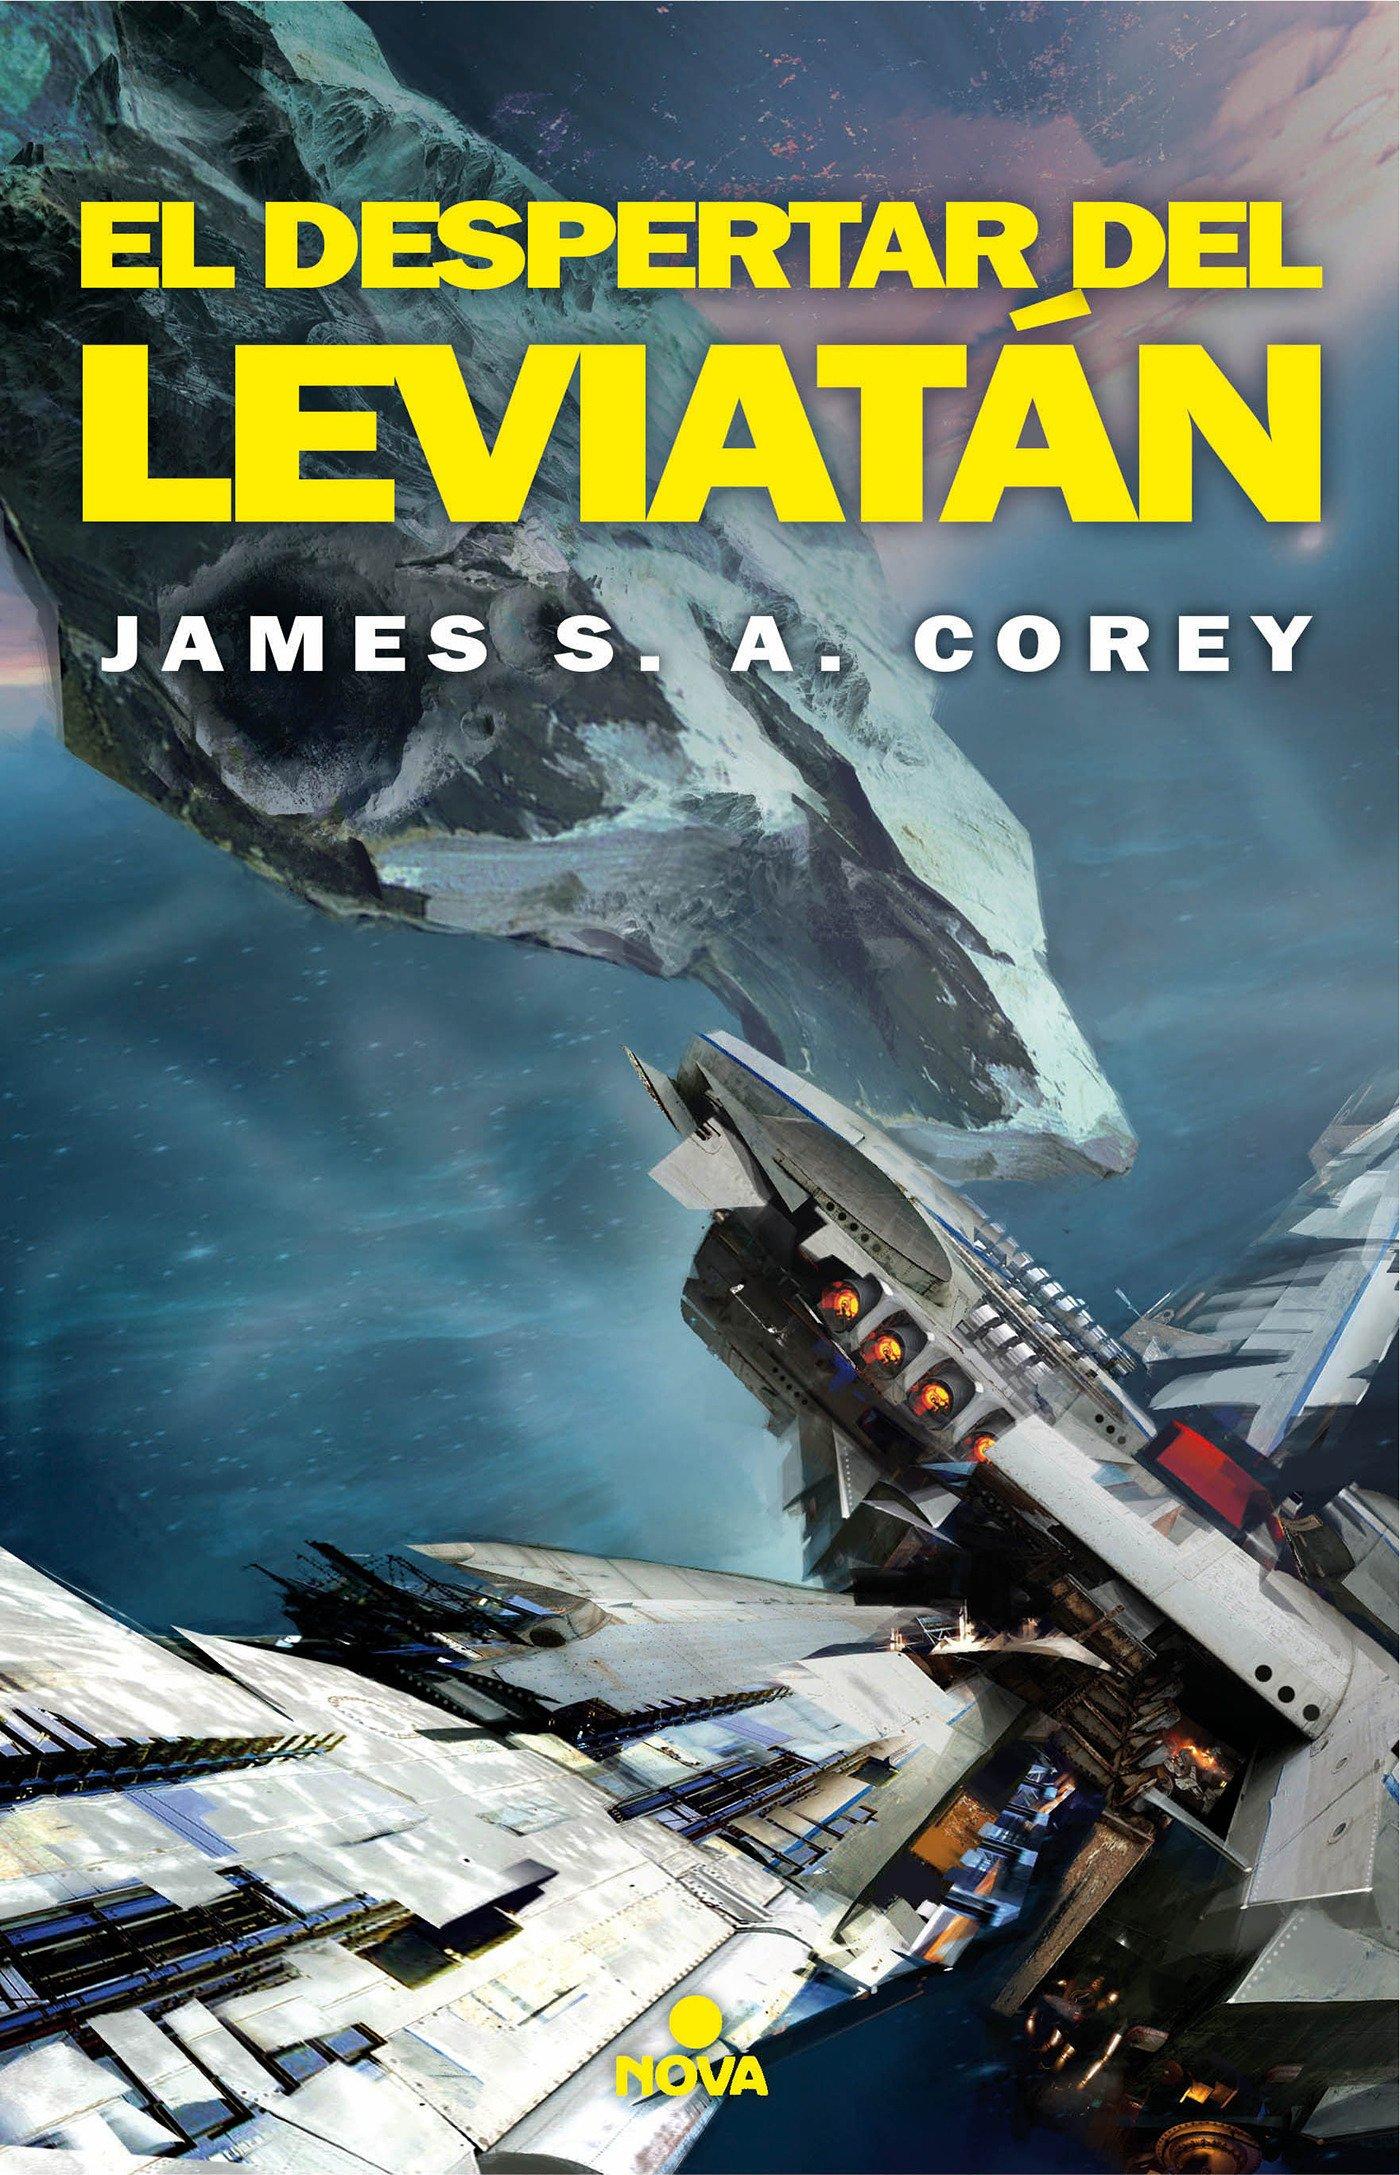 El despertar del Leviatán (The Expanse 1) (Nova) Tapa blanda – 9 nov 2016 James S.A. Corey 8466660151 Caza con trampas Ciencia-ficciaon